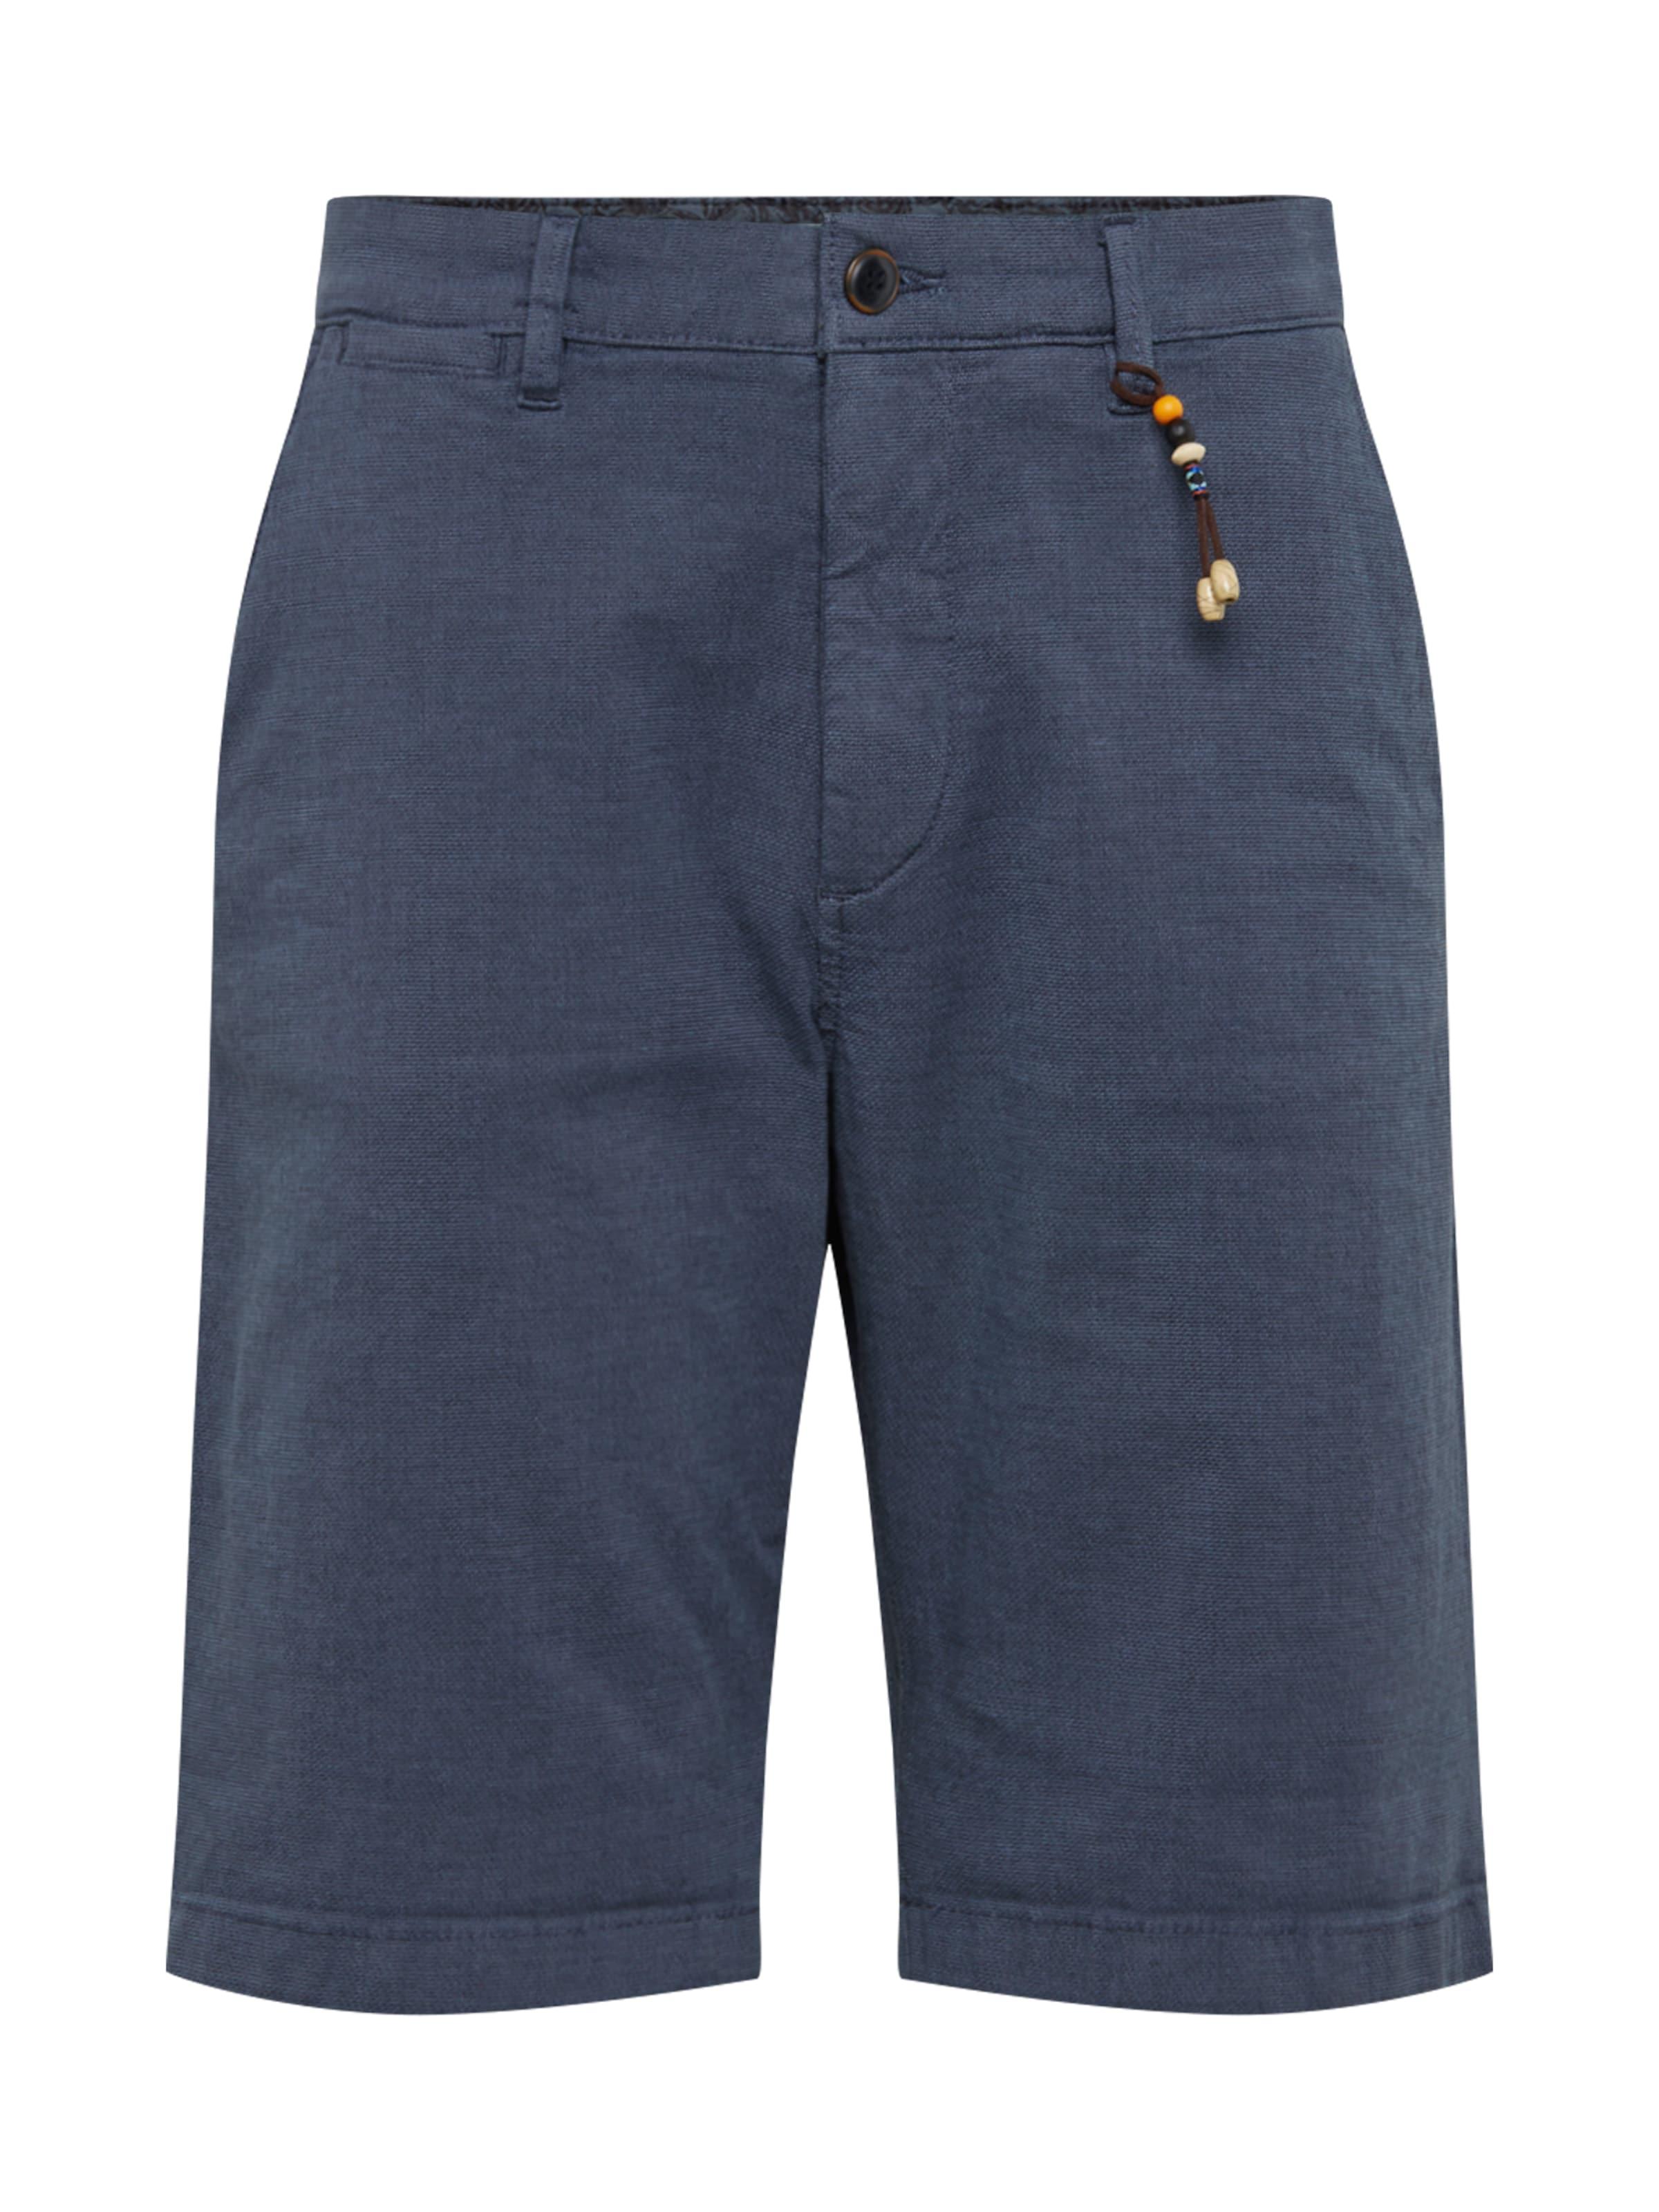 Shorts En Pantalon 432' Chino 'jjikenzo Jjchino Olive Jackamp; Akm Jones wPXk8On0